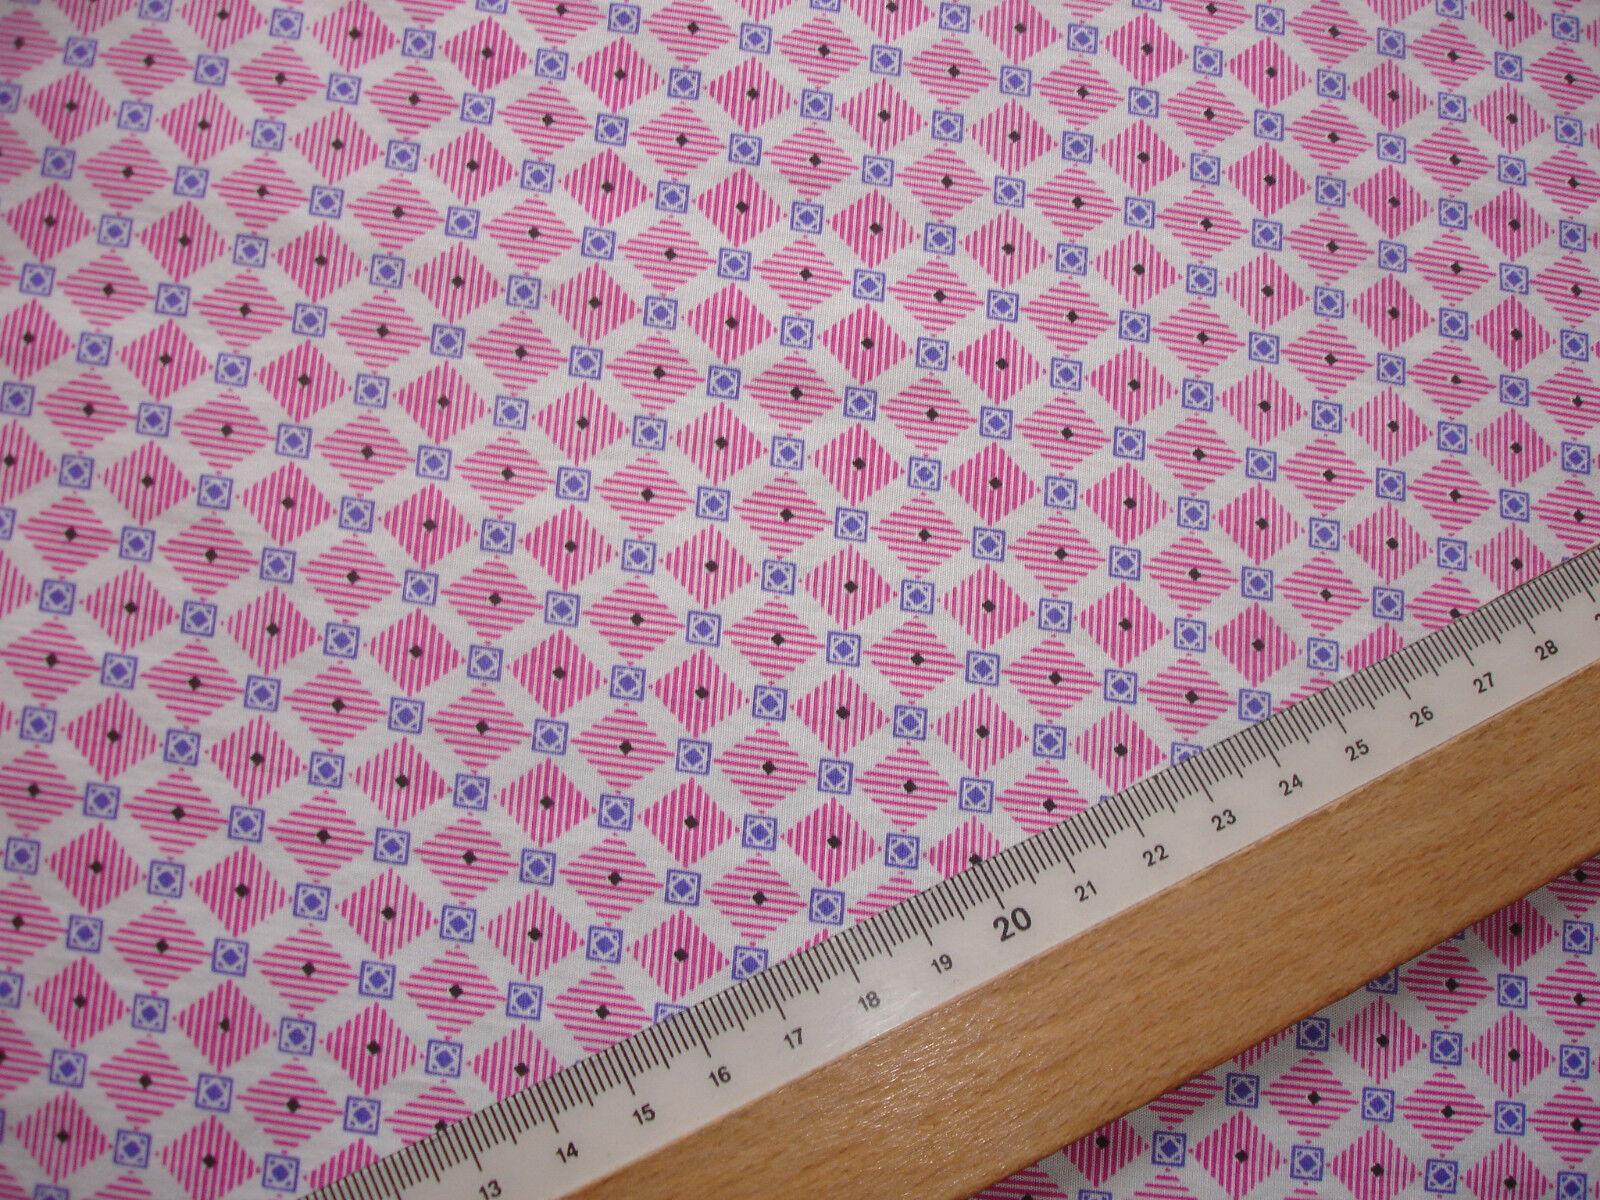 1 Lfm Baumwollbatist 2,93€/m²  weiß, rot, blau 150cm breit  MF29